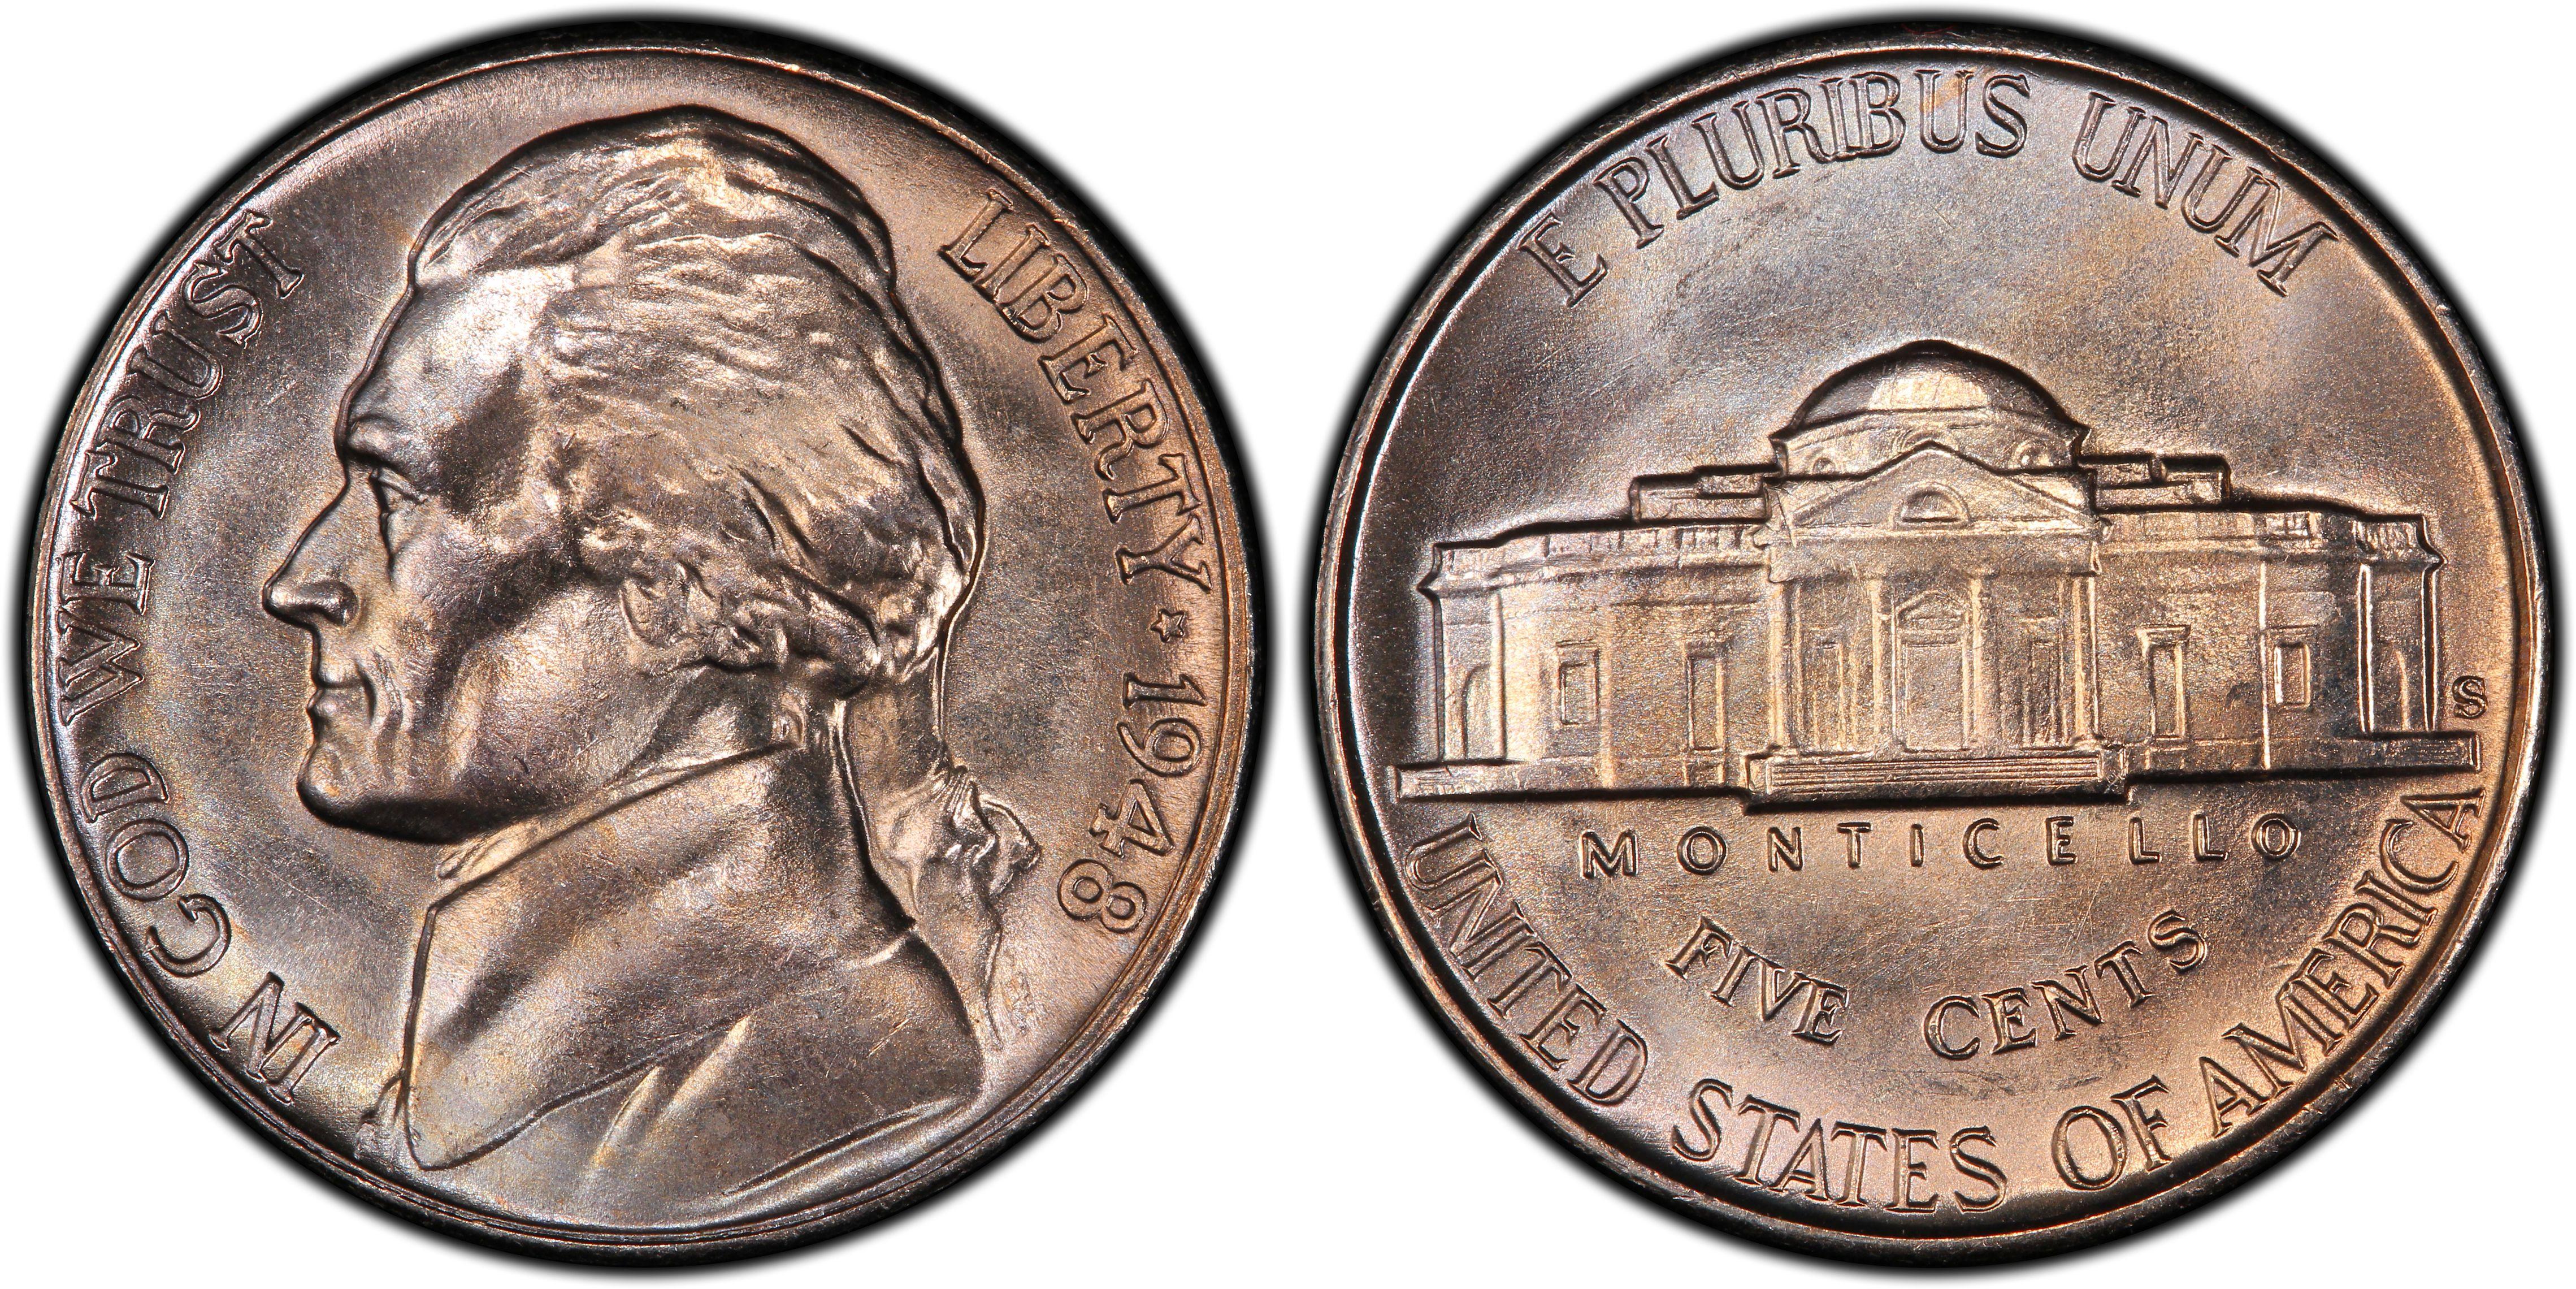 1948-S 5C, FS (Regular Strike) Jefferson Nickel - PCGS CoinFacts